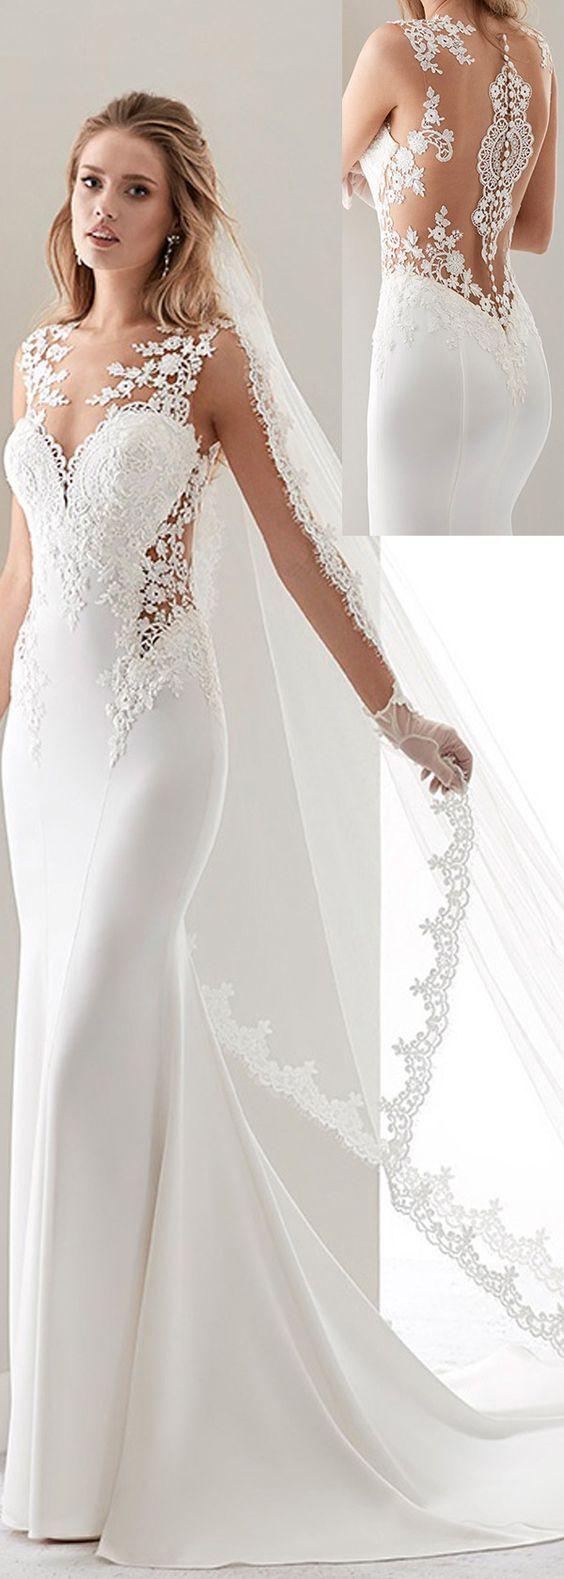 Fashionable Tulle & Acetate Satin Jewel Neckline Sheath Wedding Dresses With Lace Appliques